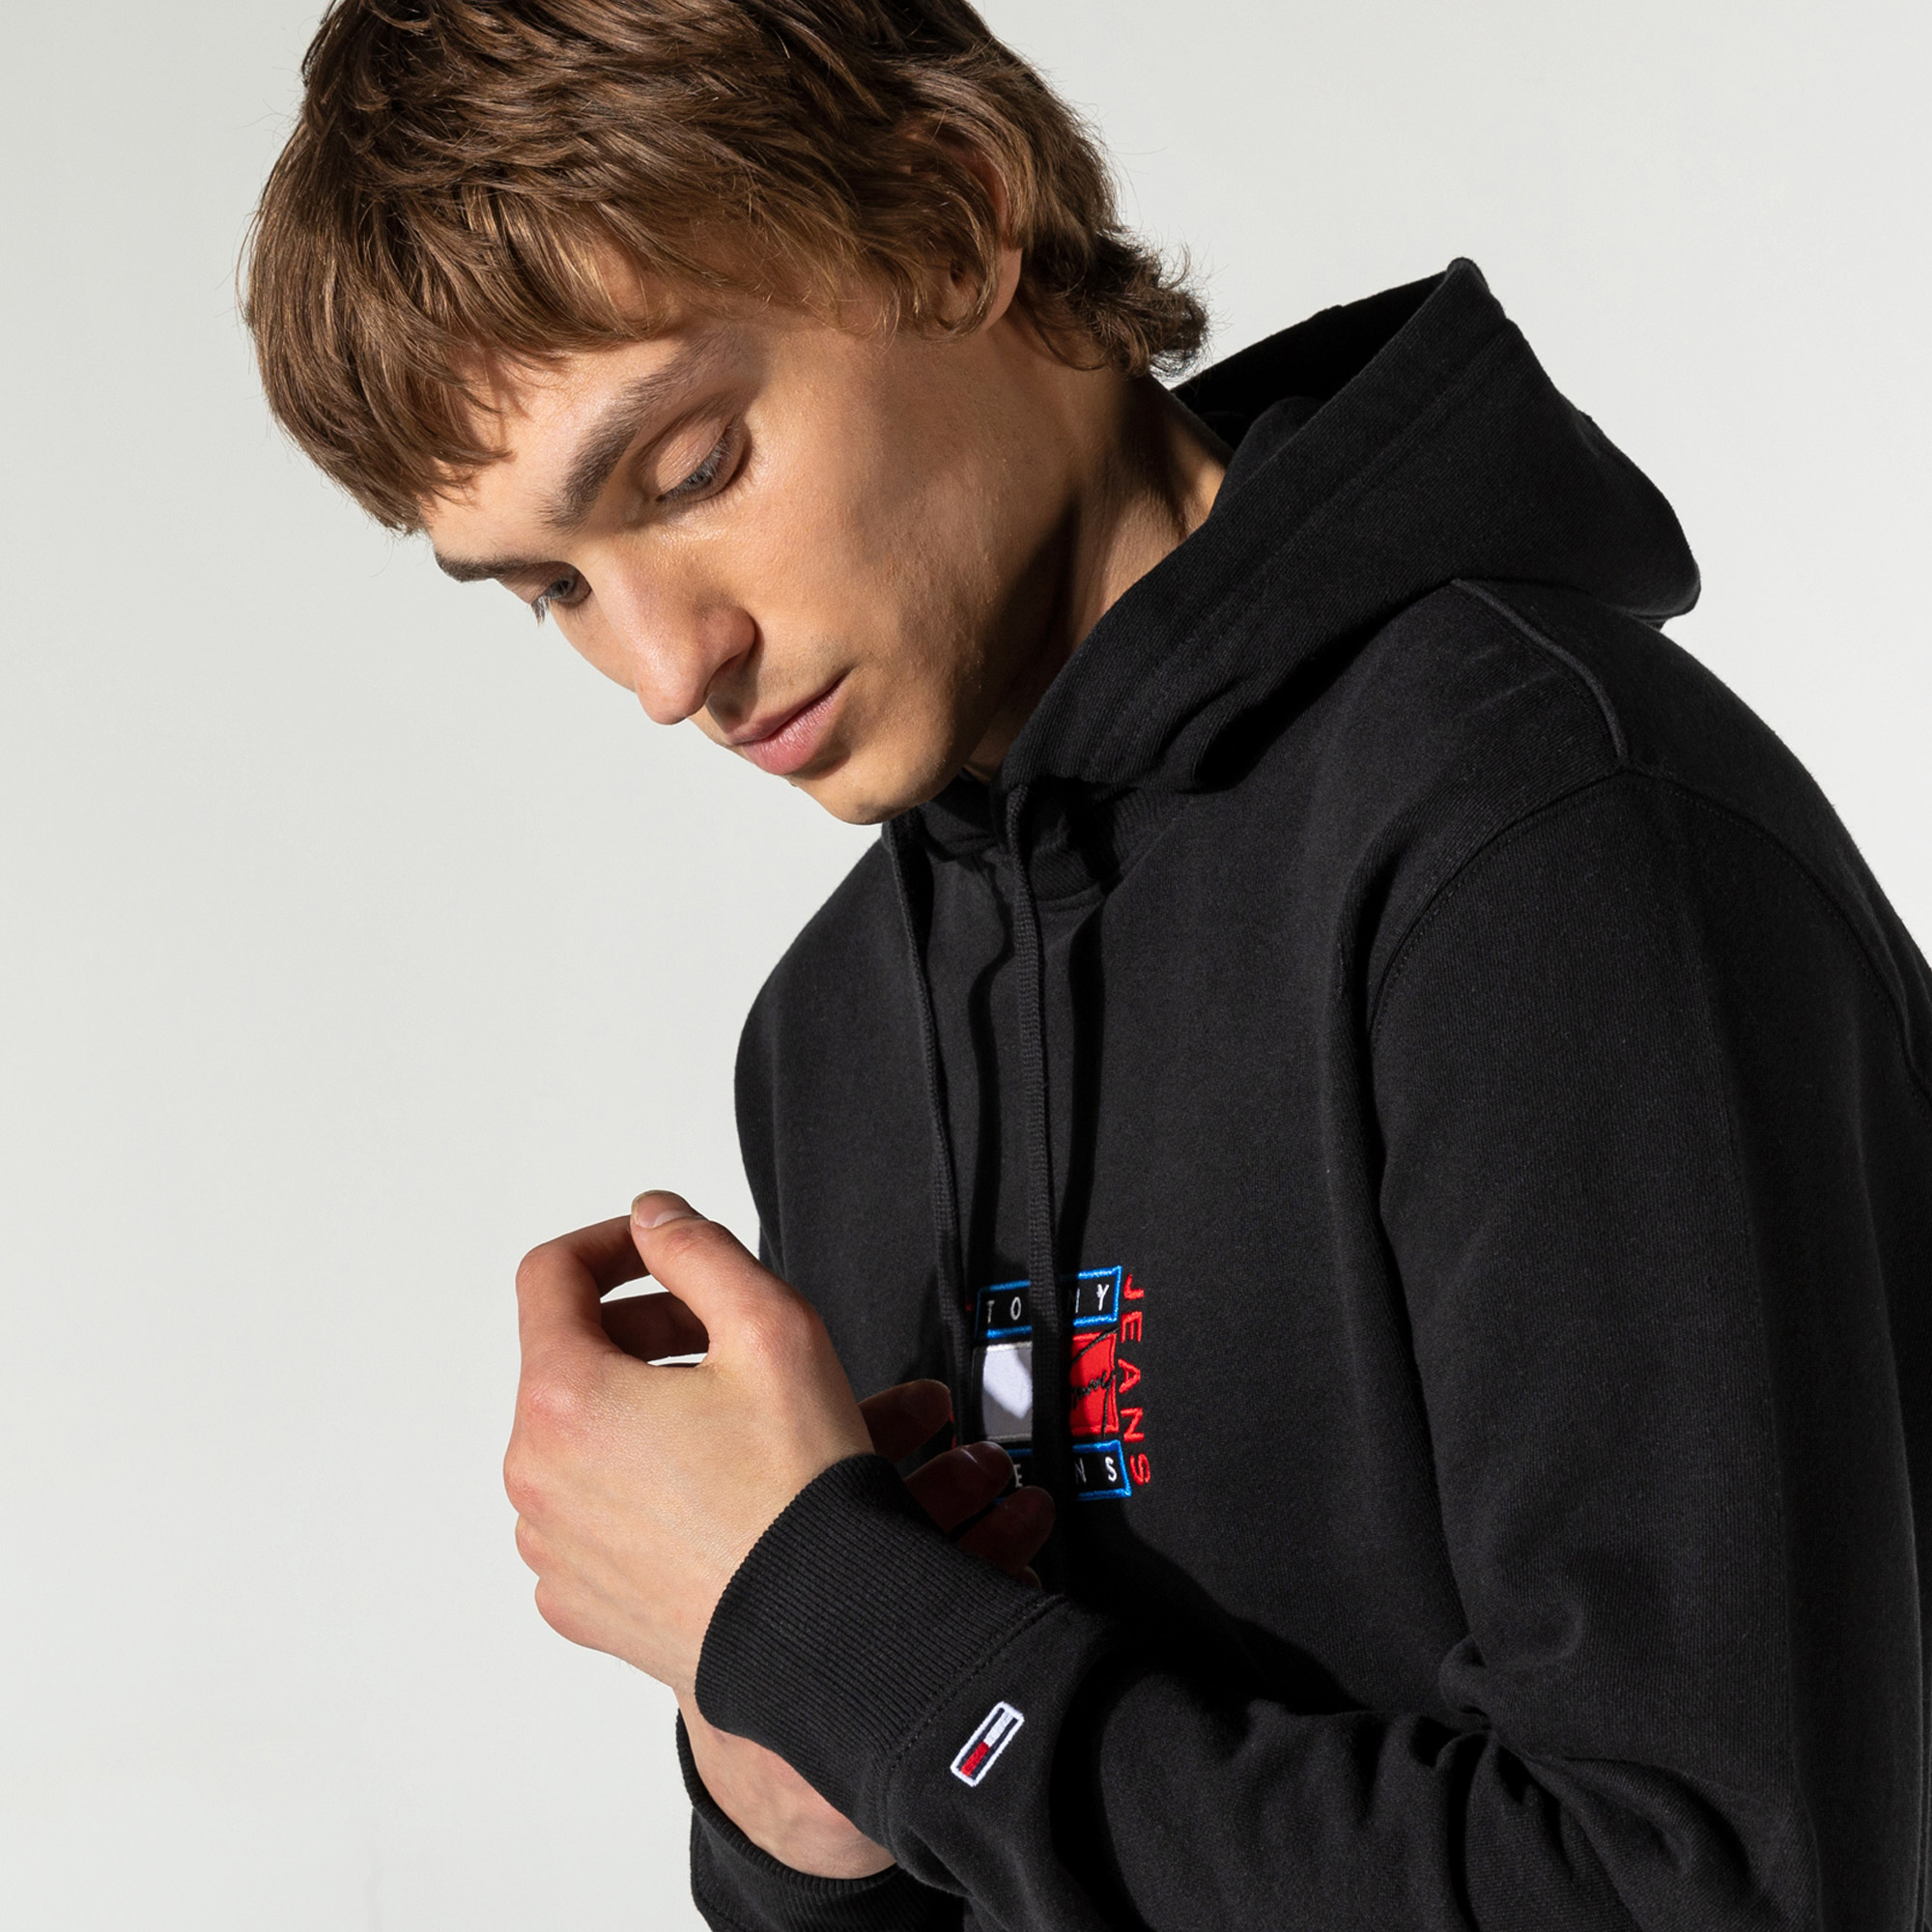 Tommy Hilfiger TJM Timeless Tommy 3 Erkek Siyah Sweatshirt